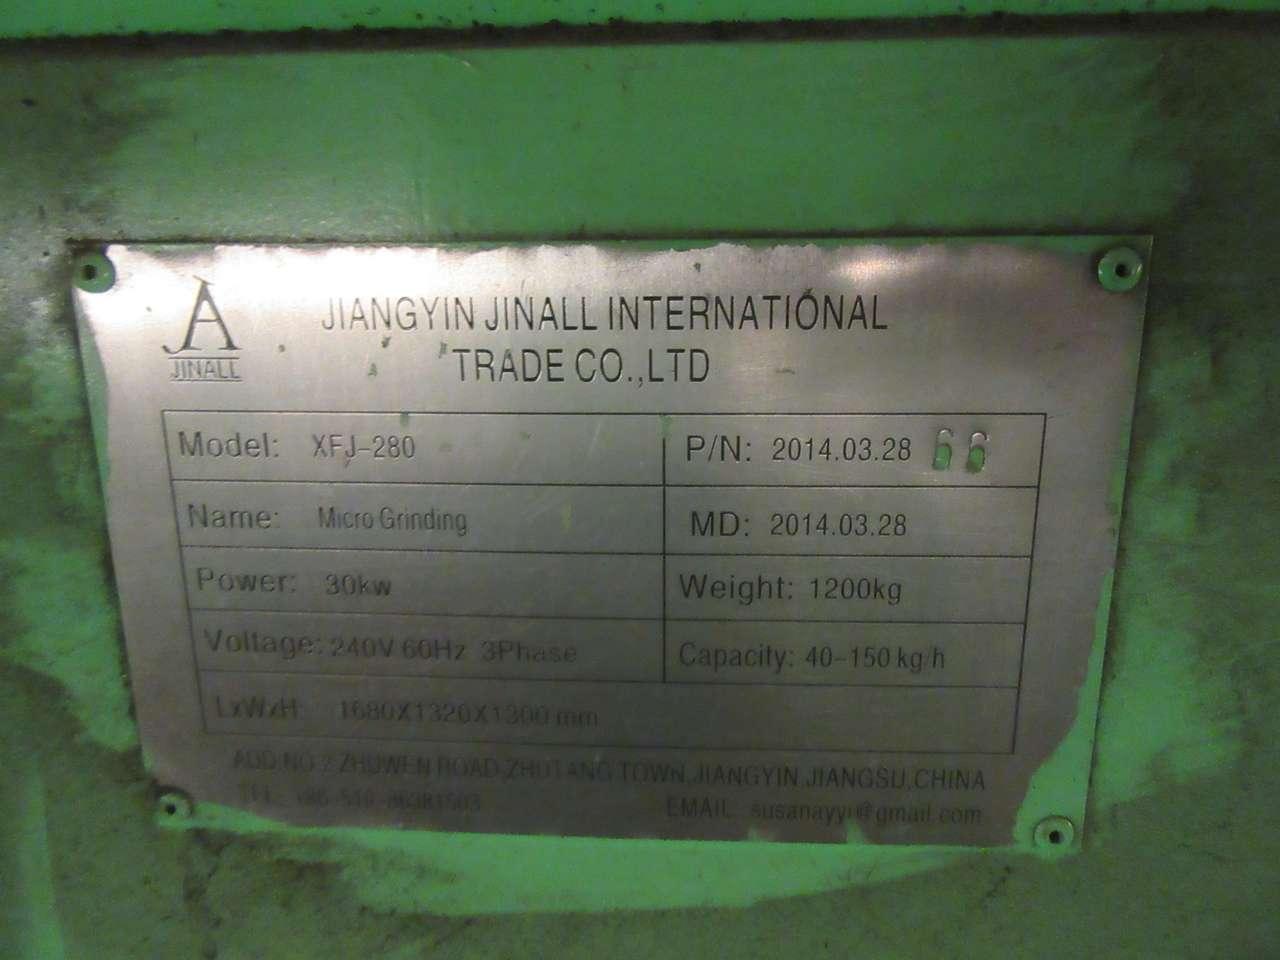 Lot 15 - 2014 Jiangyin Jinall International Trade Co. XFJ-280 Micro Grinder